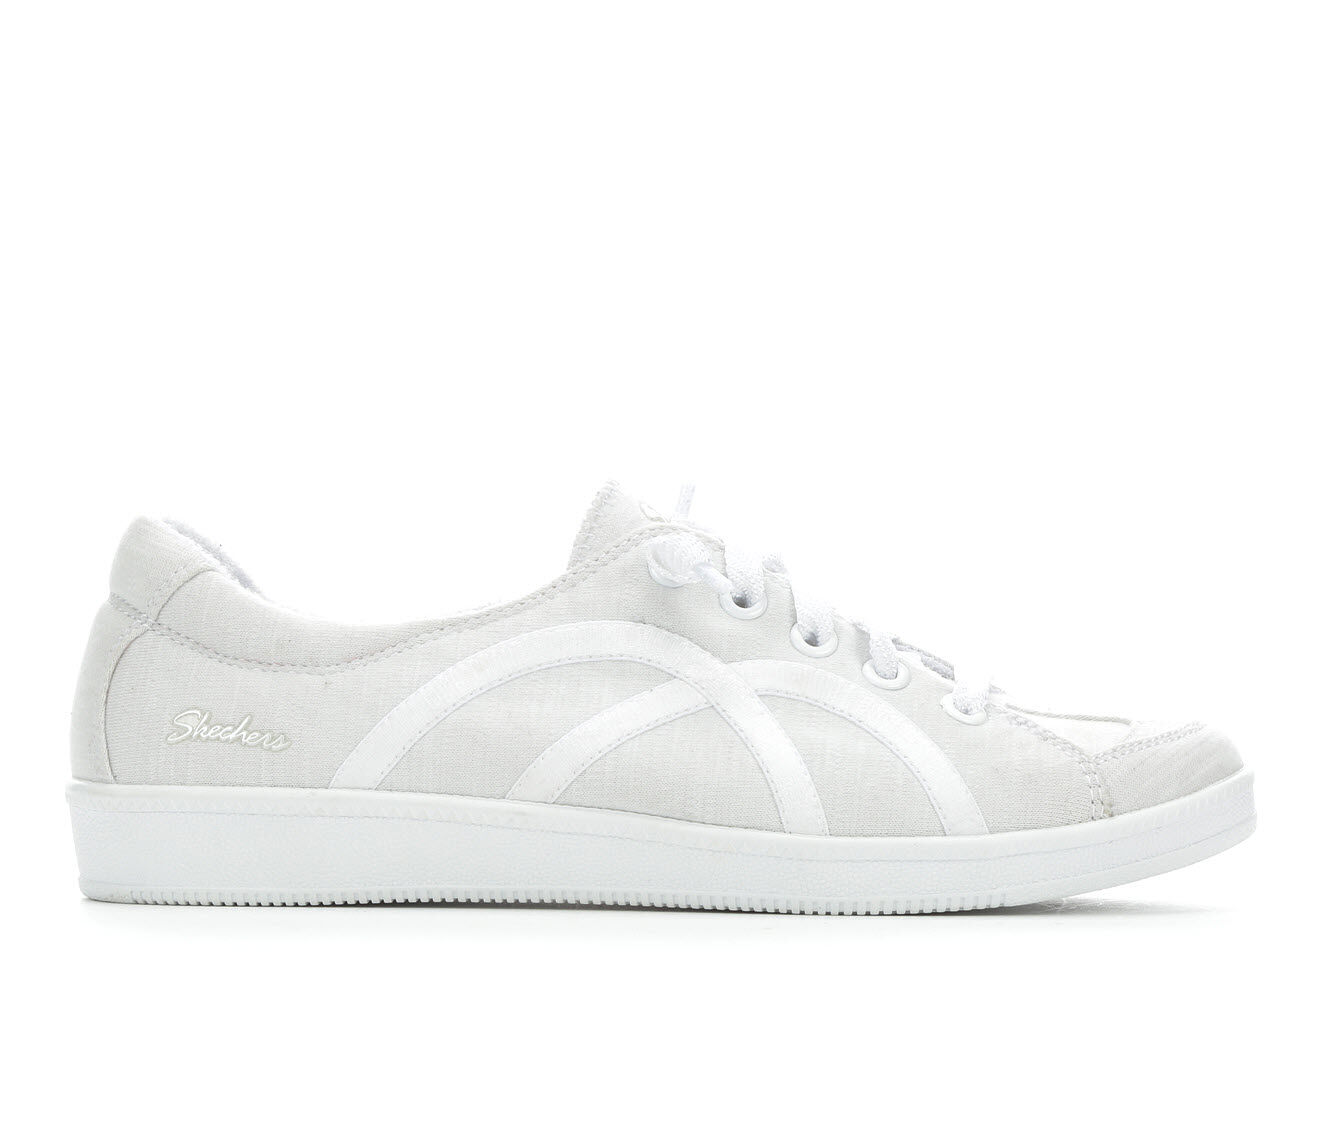 Women's Skechers Take A Walk 23958 Sneakers White